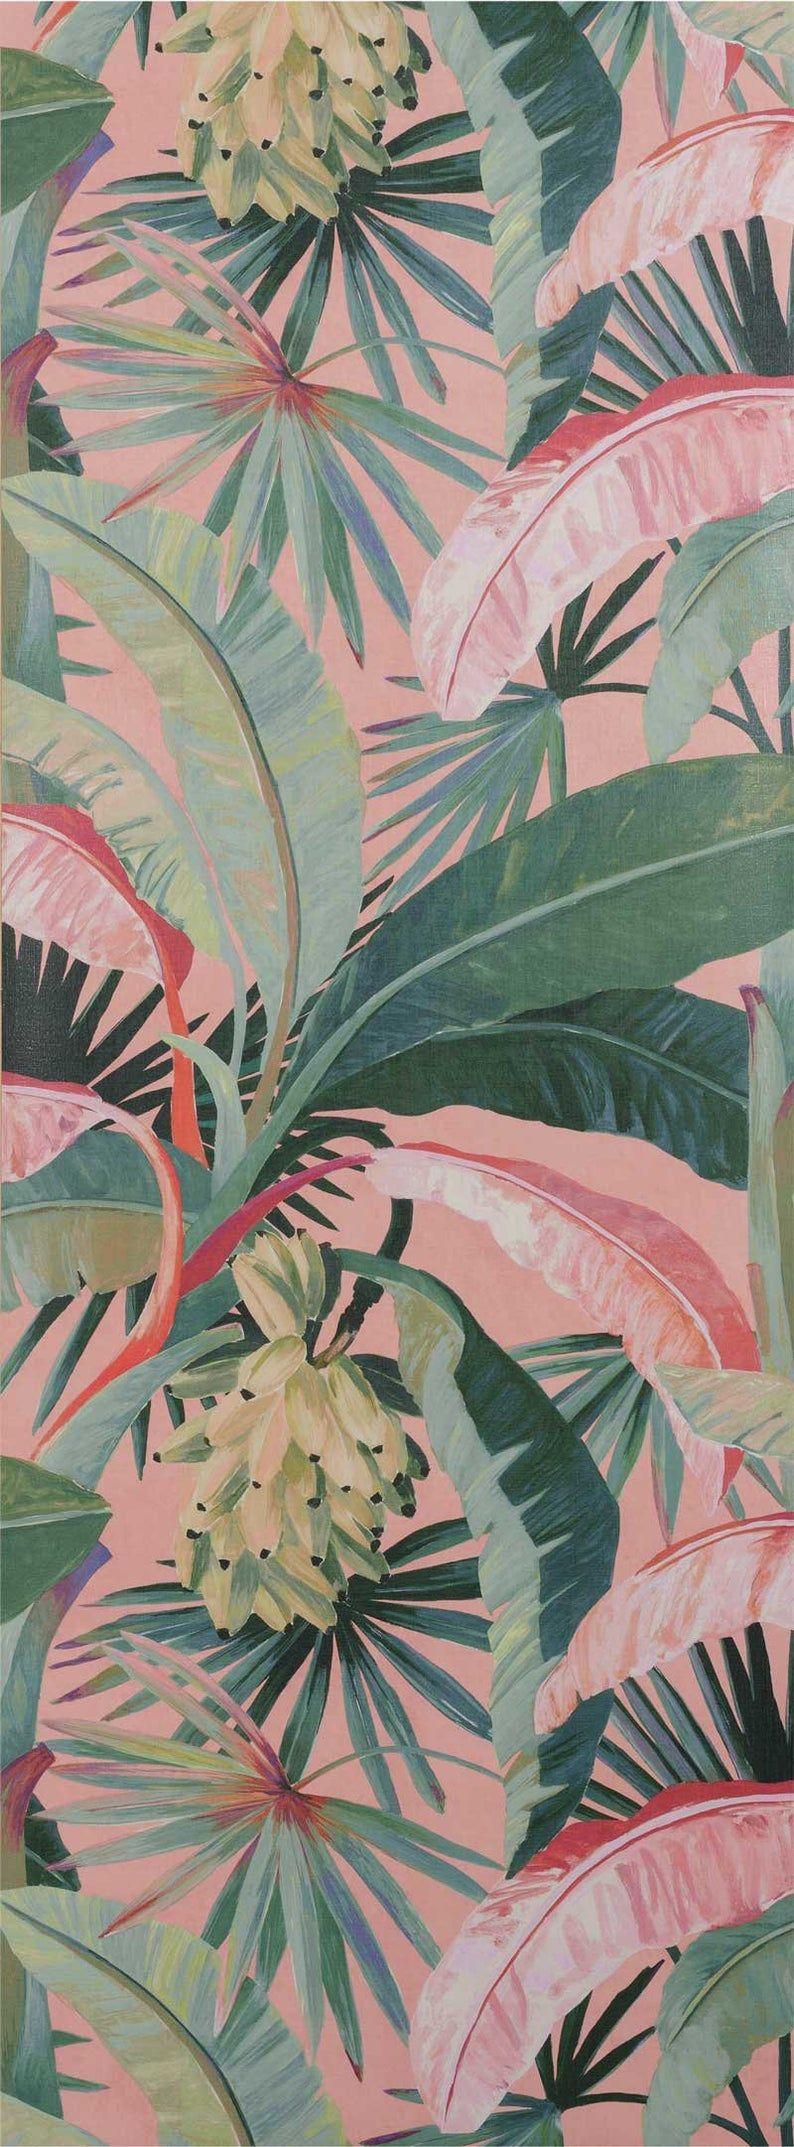 La Palma wallpaper/ wallcovering - feature wall - tropical palm tree wallpaper - banana leaves leaf jungle Hollywood green exotic